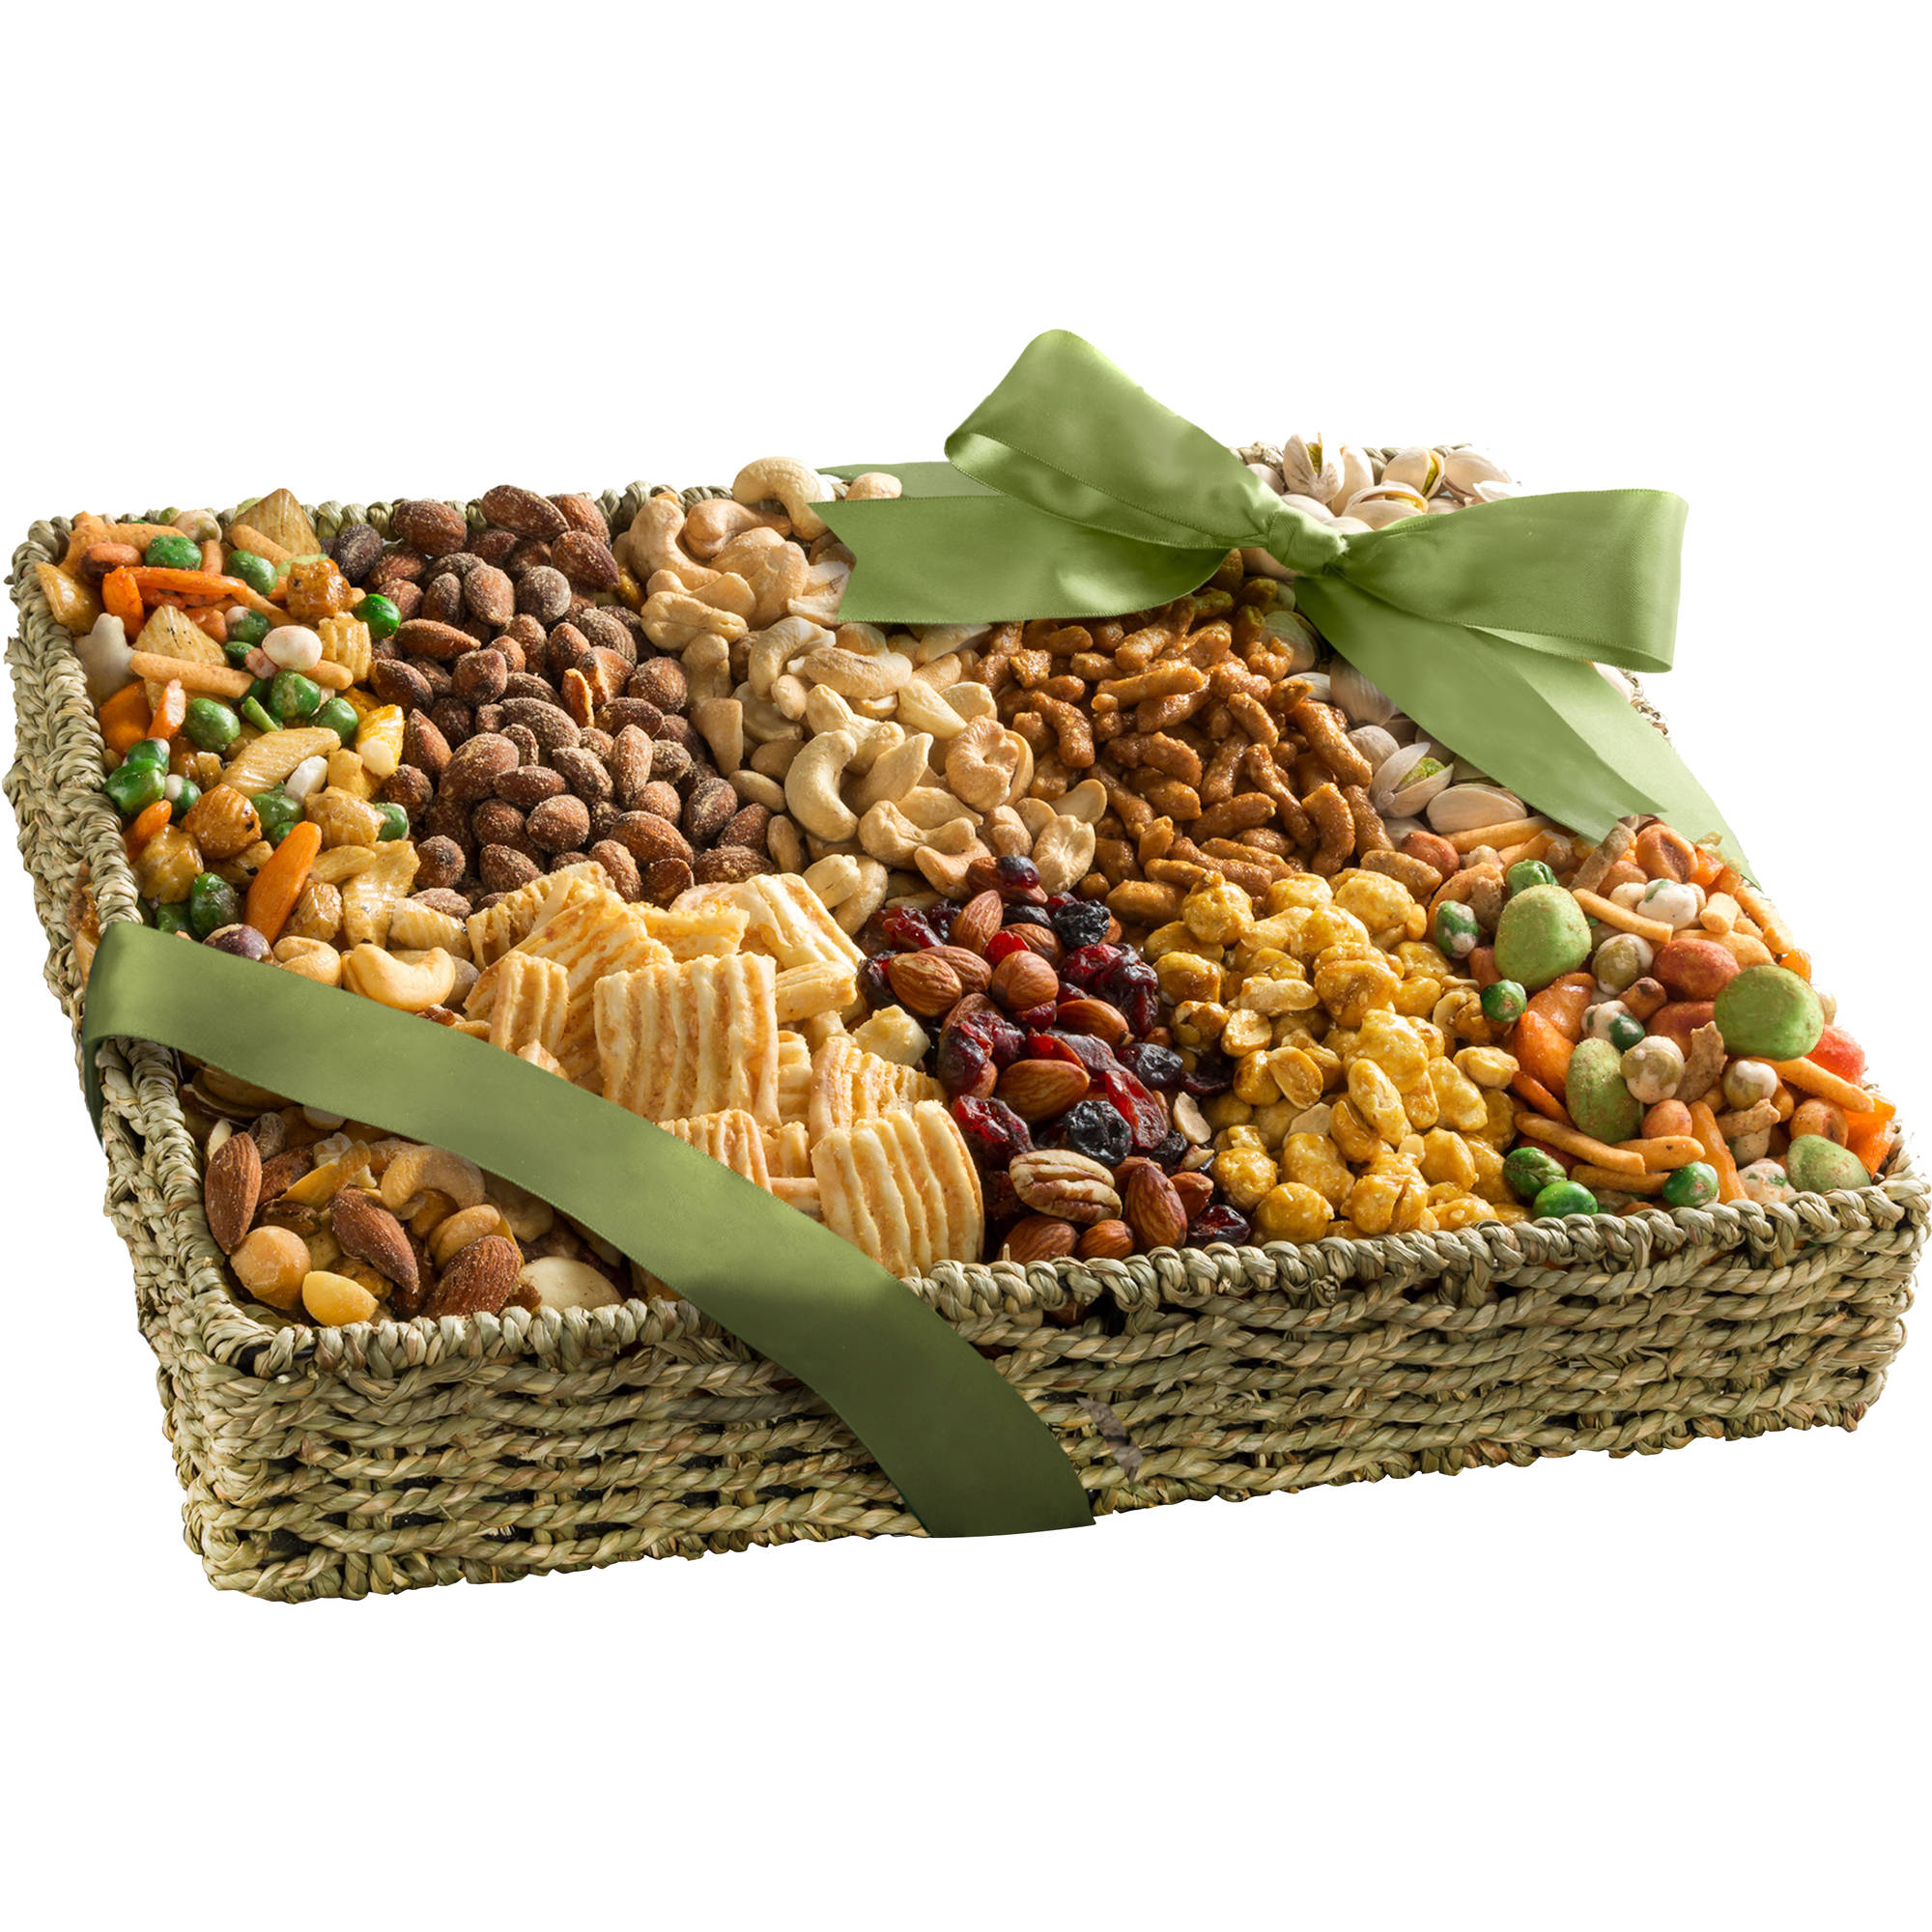 Golden State Fruit Best Savory Snacks Gift Basket